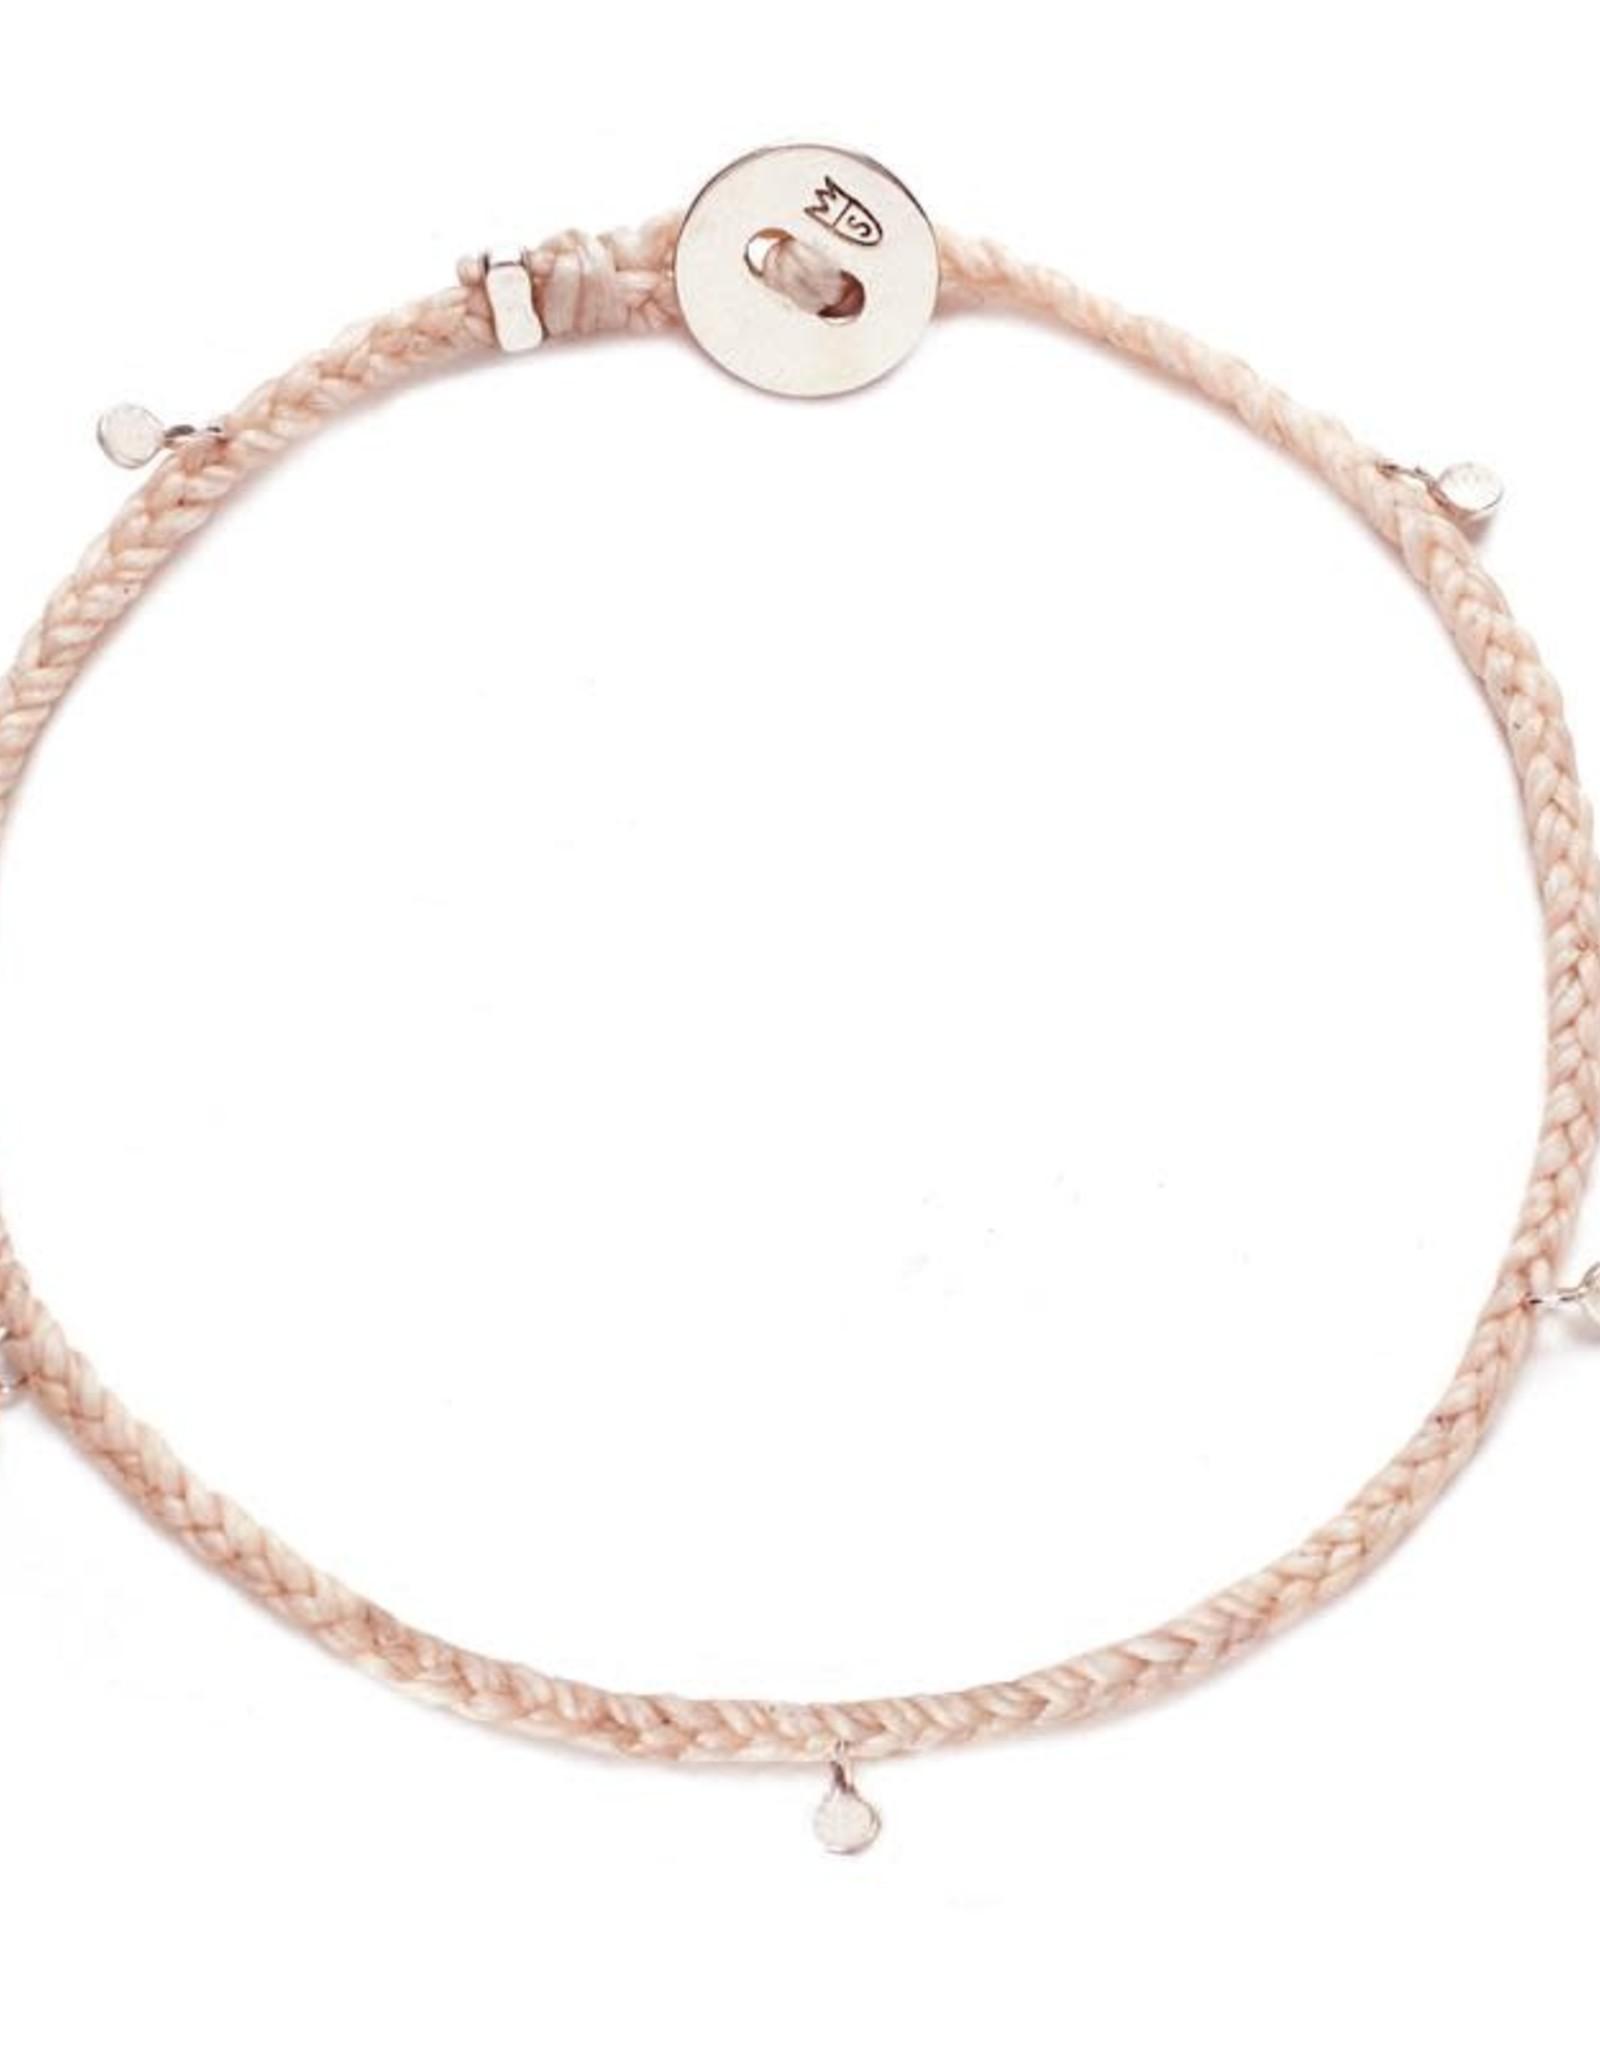 Scosha Fairy Bead Silver Bracelet - Ballet